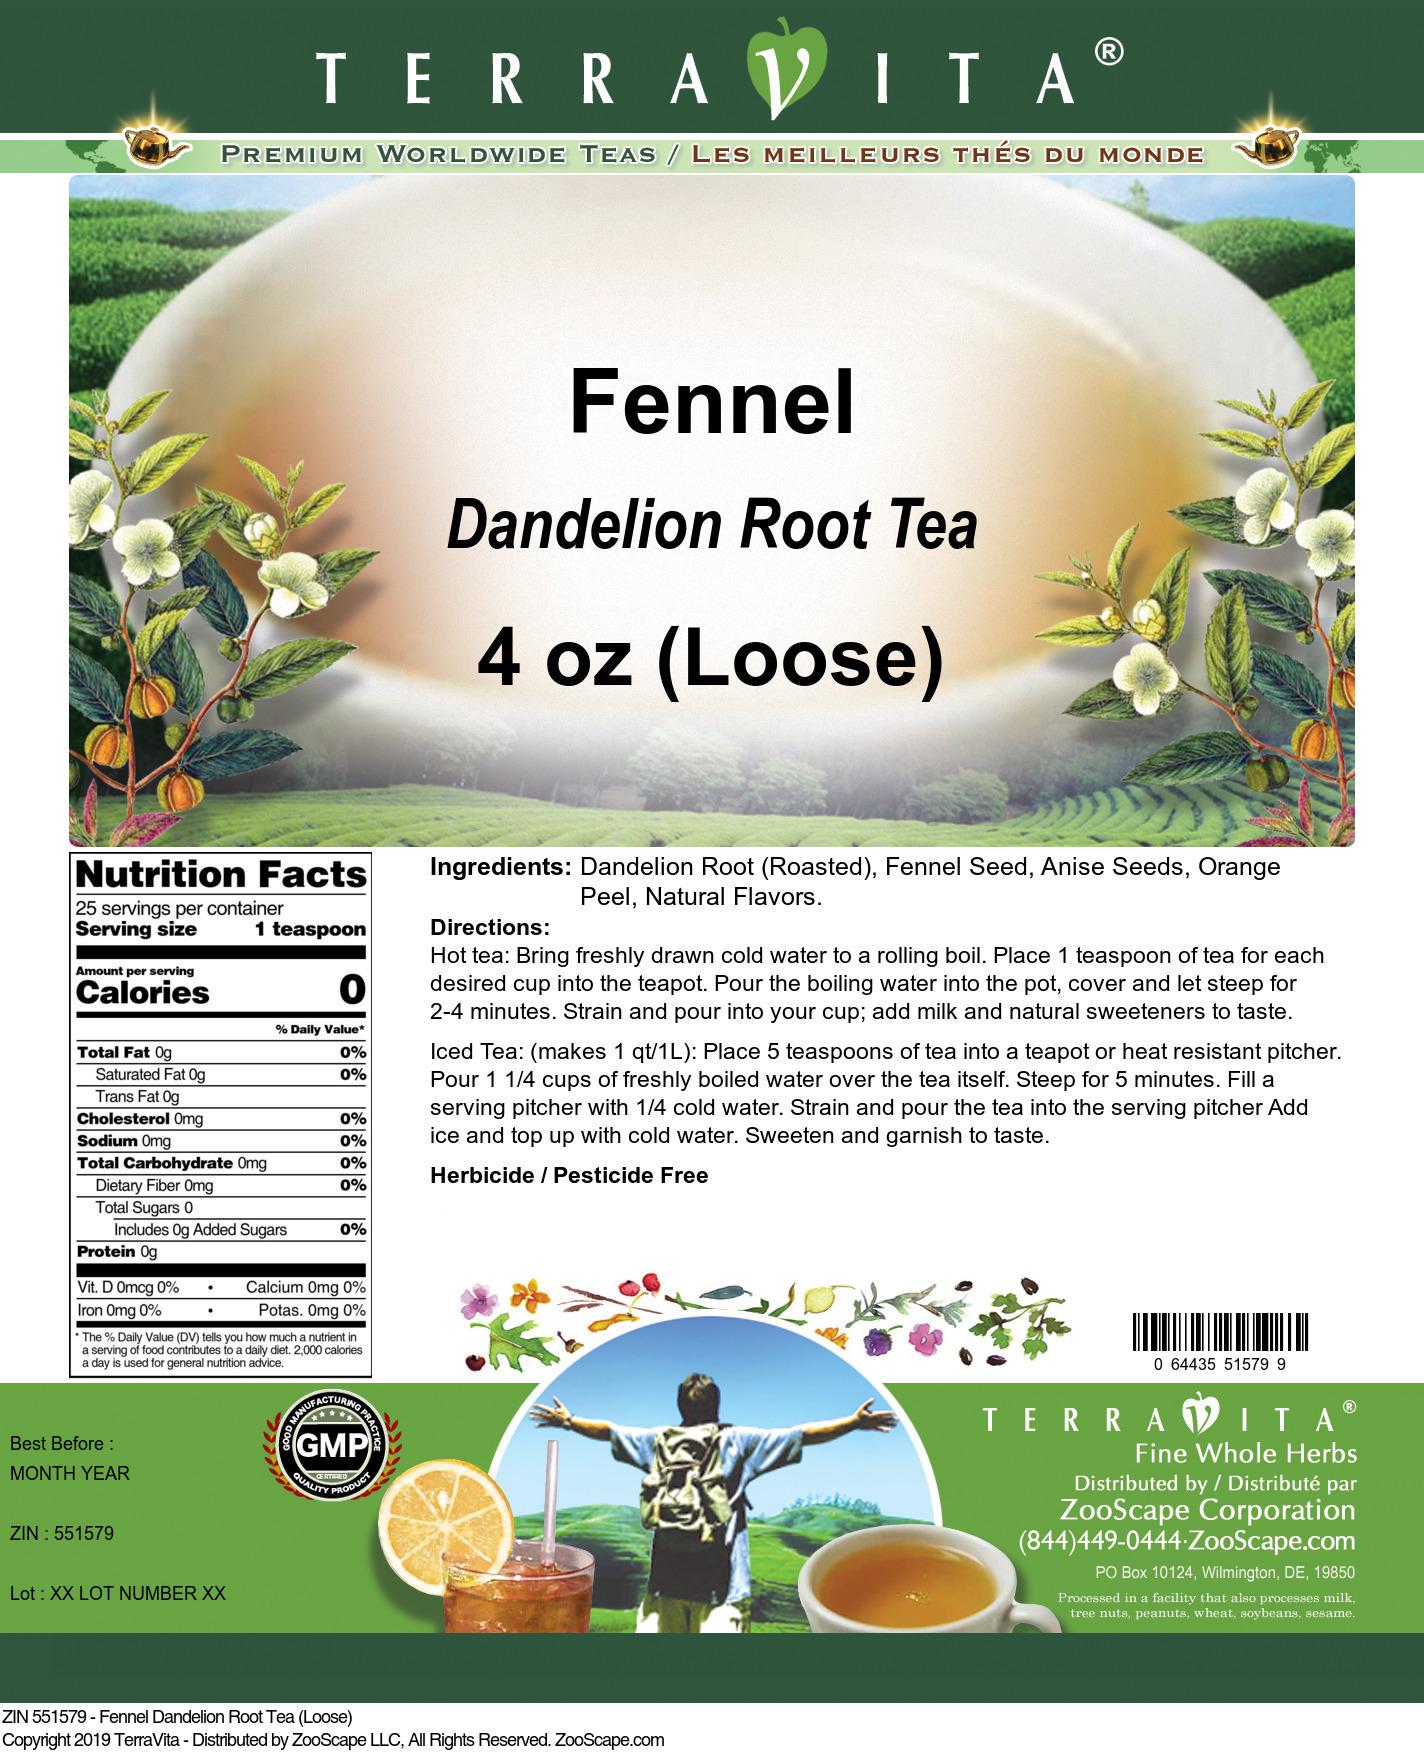 Fennel Dandelion Root